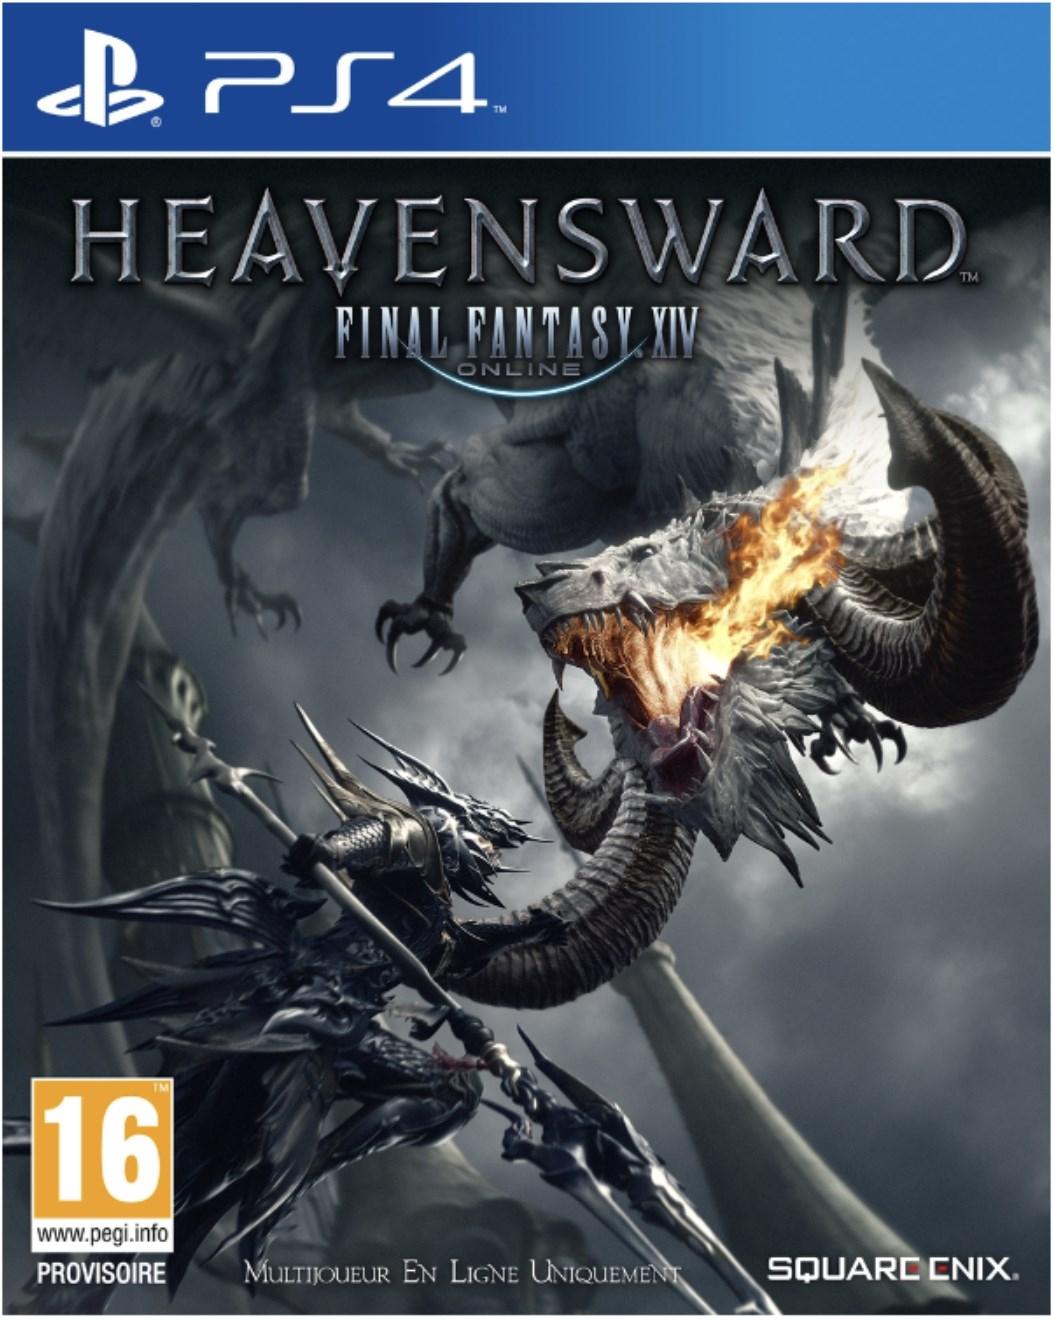 Jeu Final Fantasy XIV Heavensword sur PS4